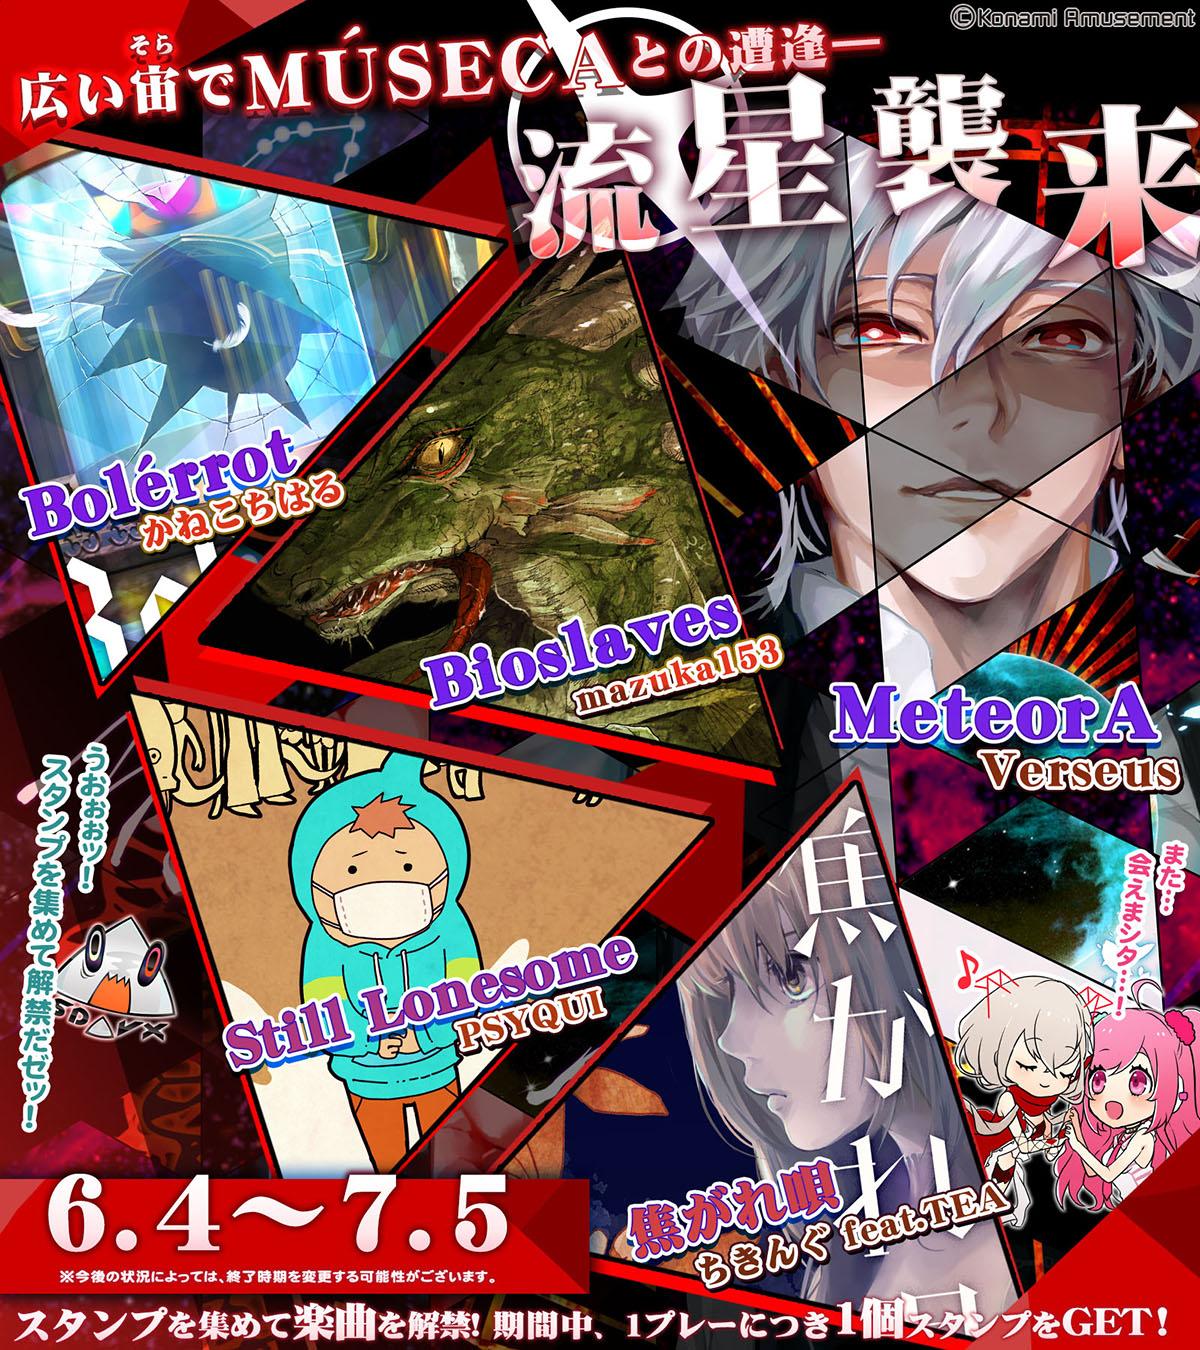 https://eacache.s.konaminet.jp/game/sdvx/v/p/images/p/top/top_image/200604_museca.jpg